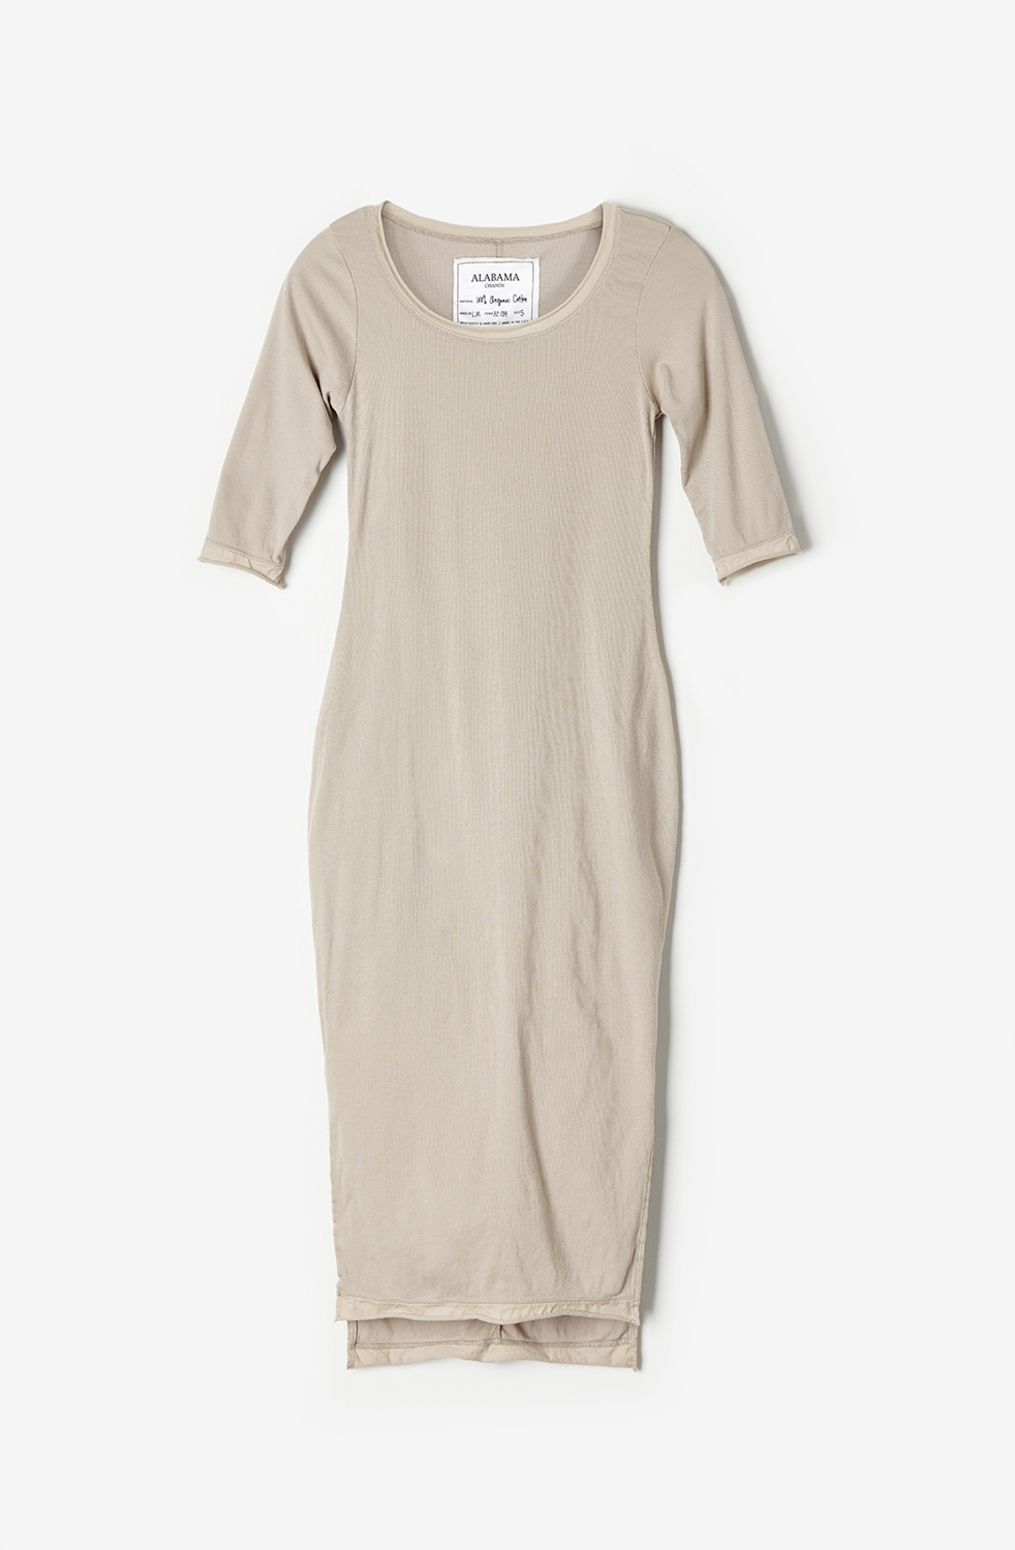 Alabama chanin the scoop dress